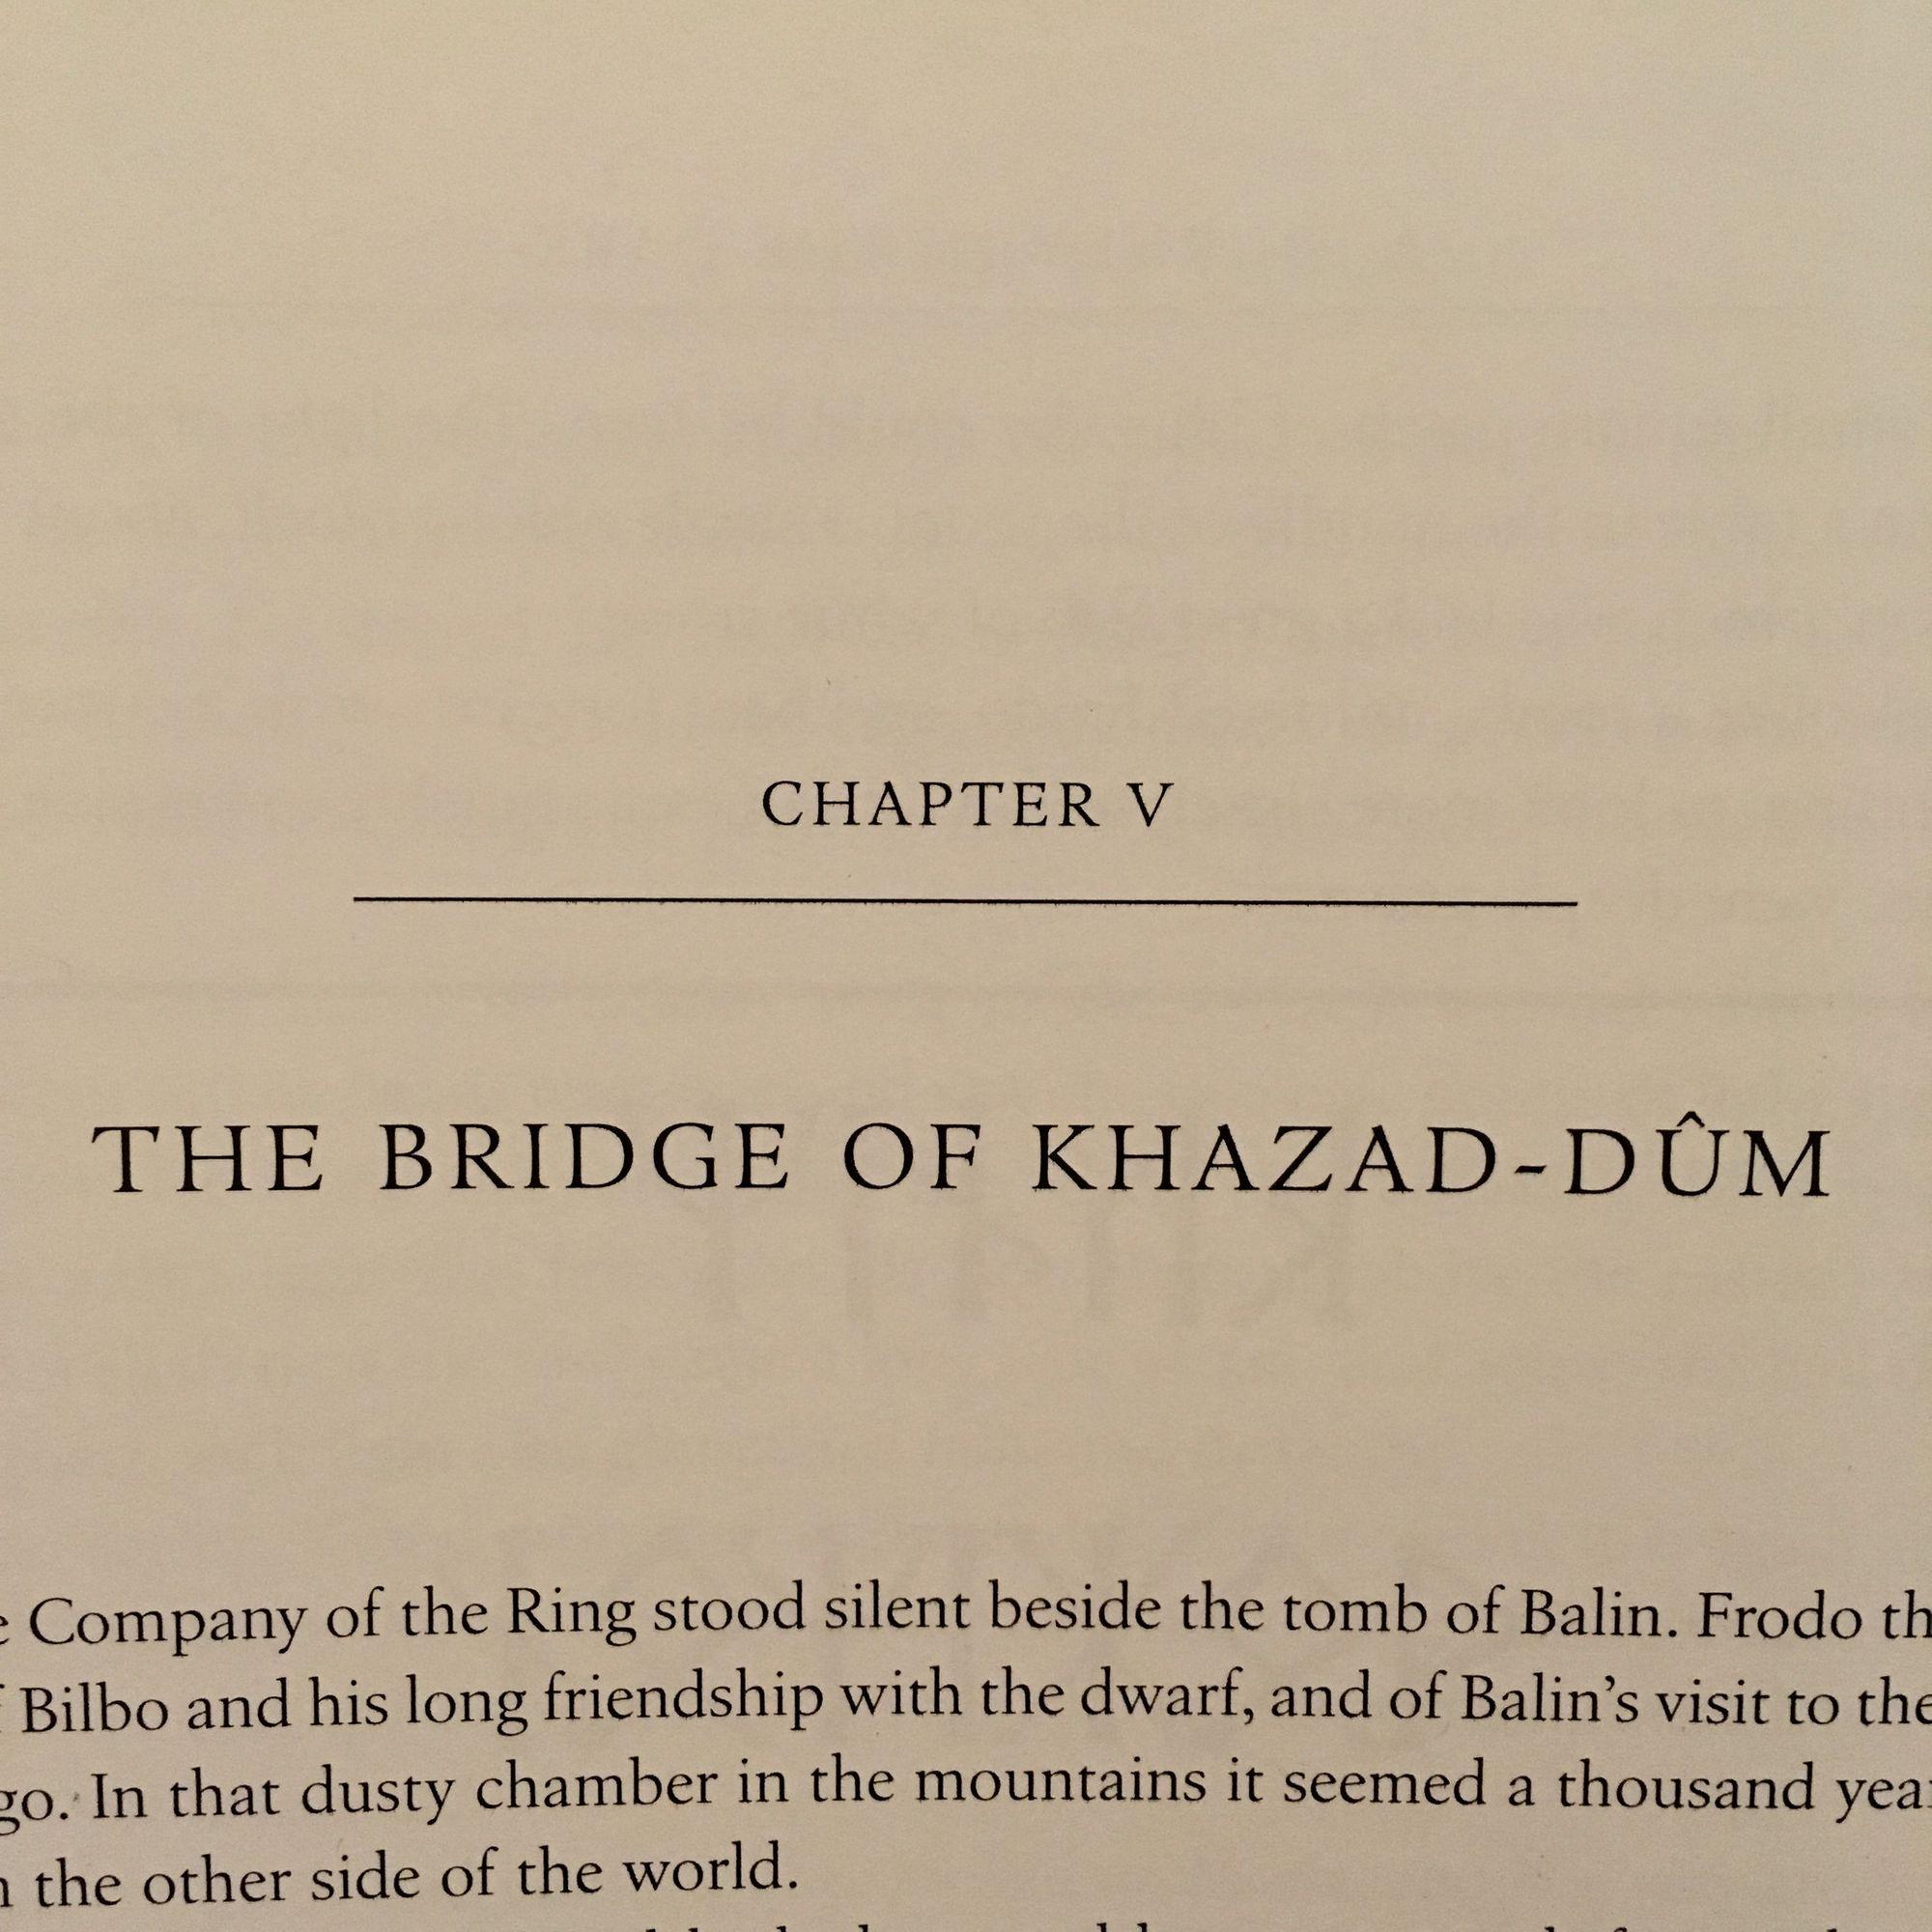 The Fellowship of the Ring: The Bridge of Khazad-dûm